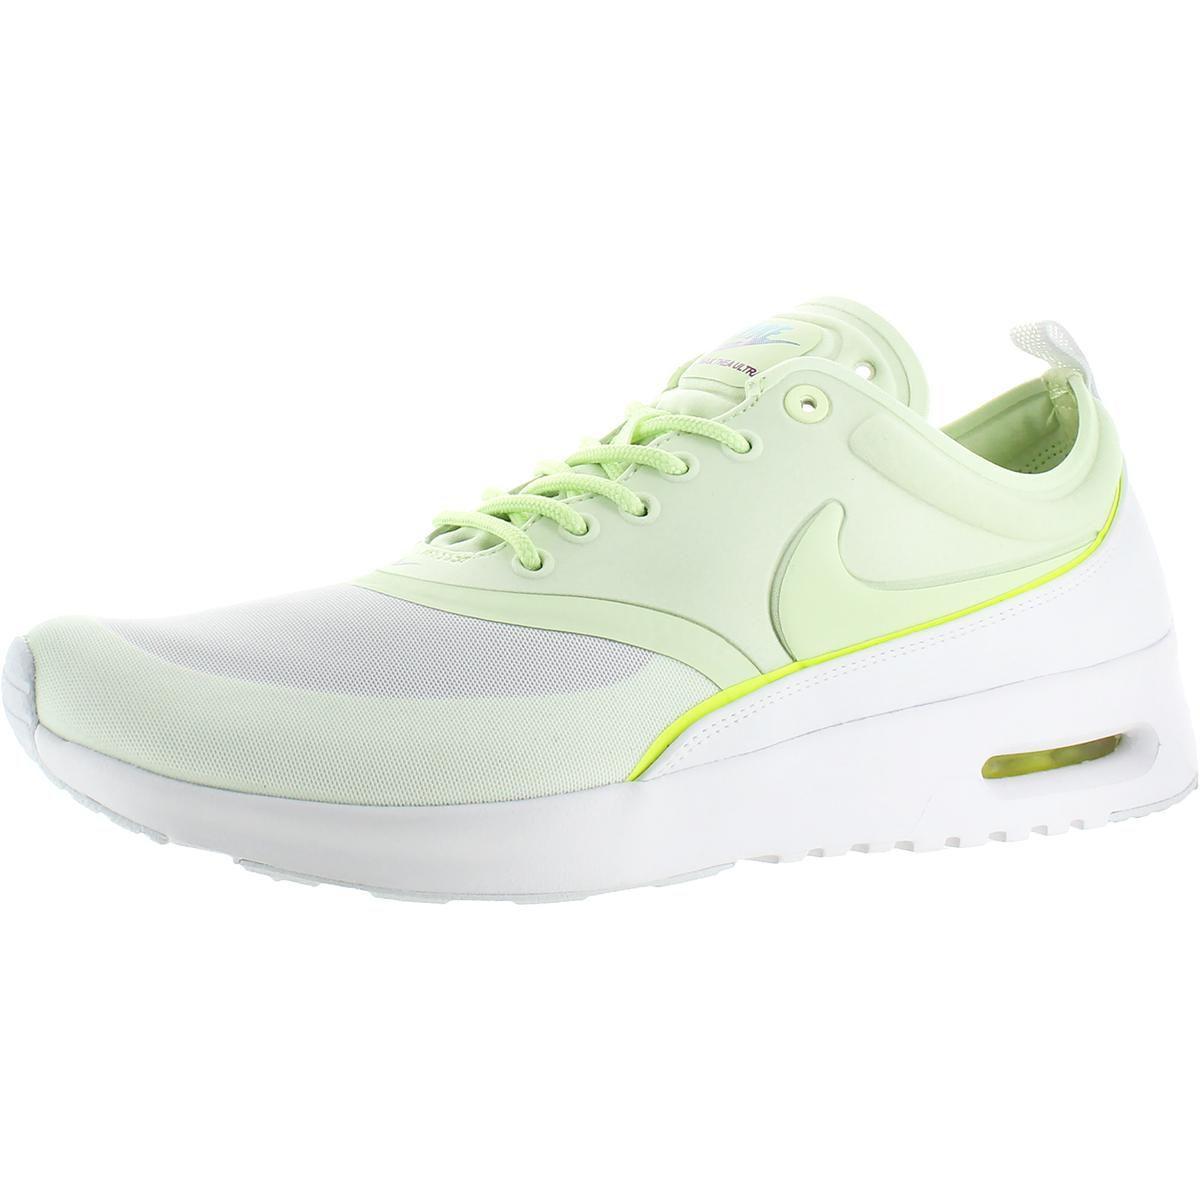 buy popular 56950 28d1b Nike - Green Womens Air Max Thea Ultra Mesh Perforated Running Shoes - Lyst.  View fullscreen